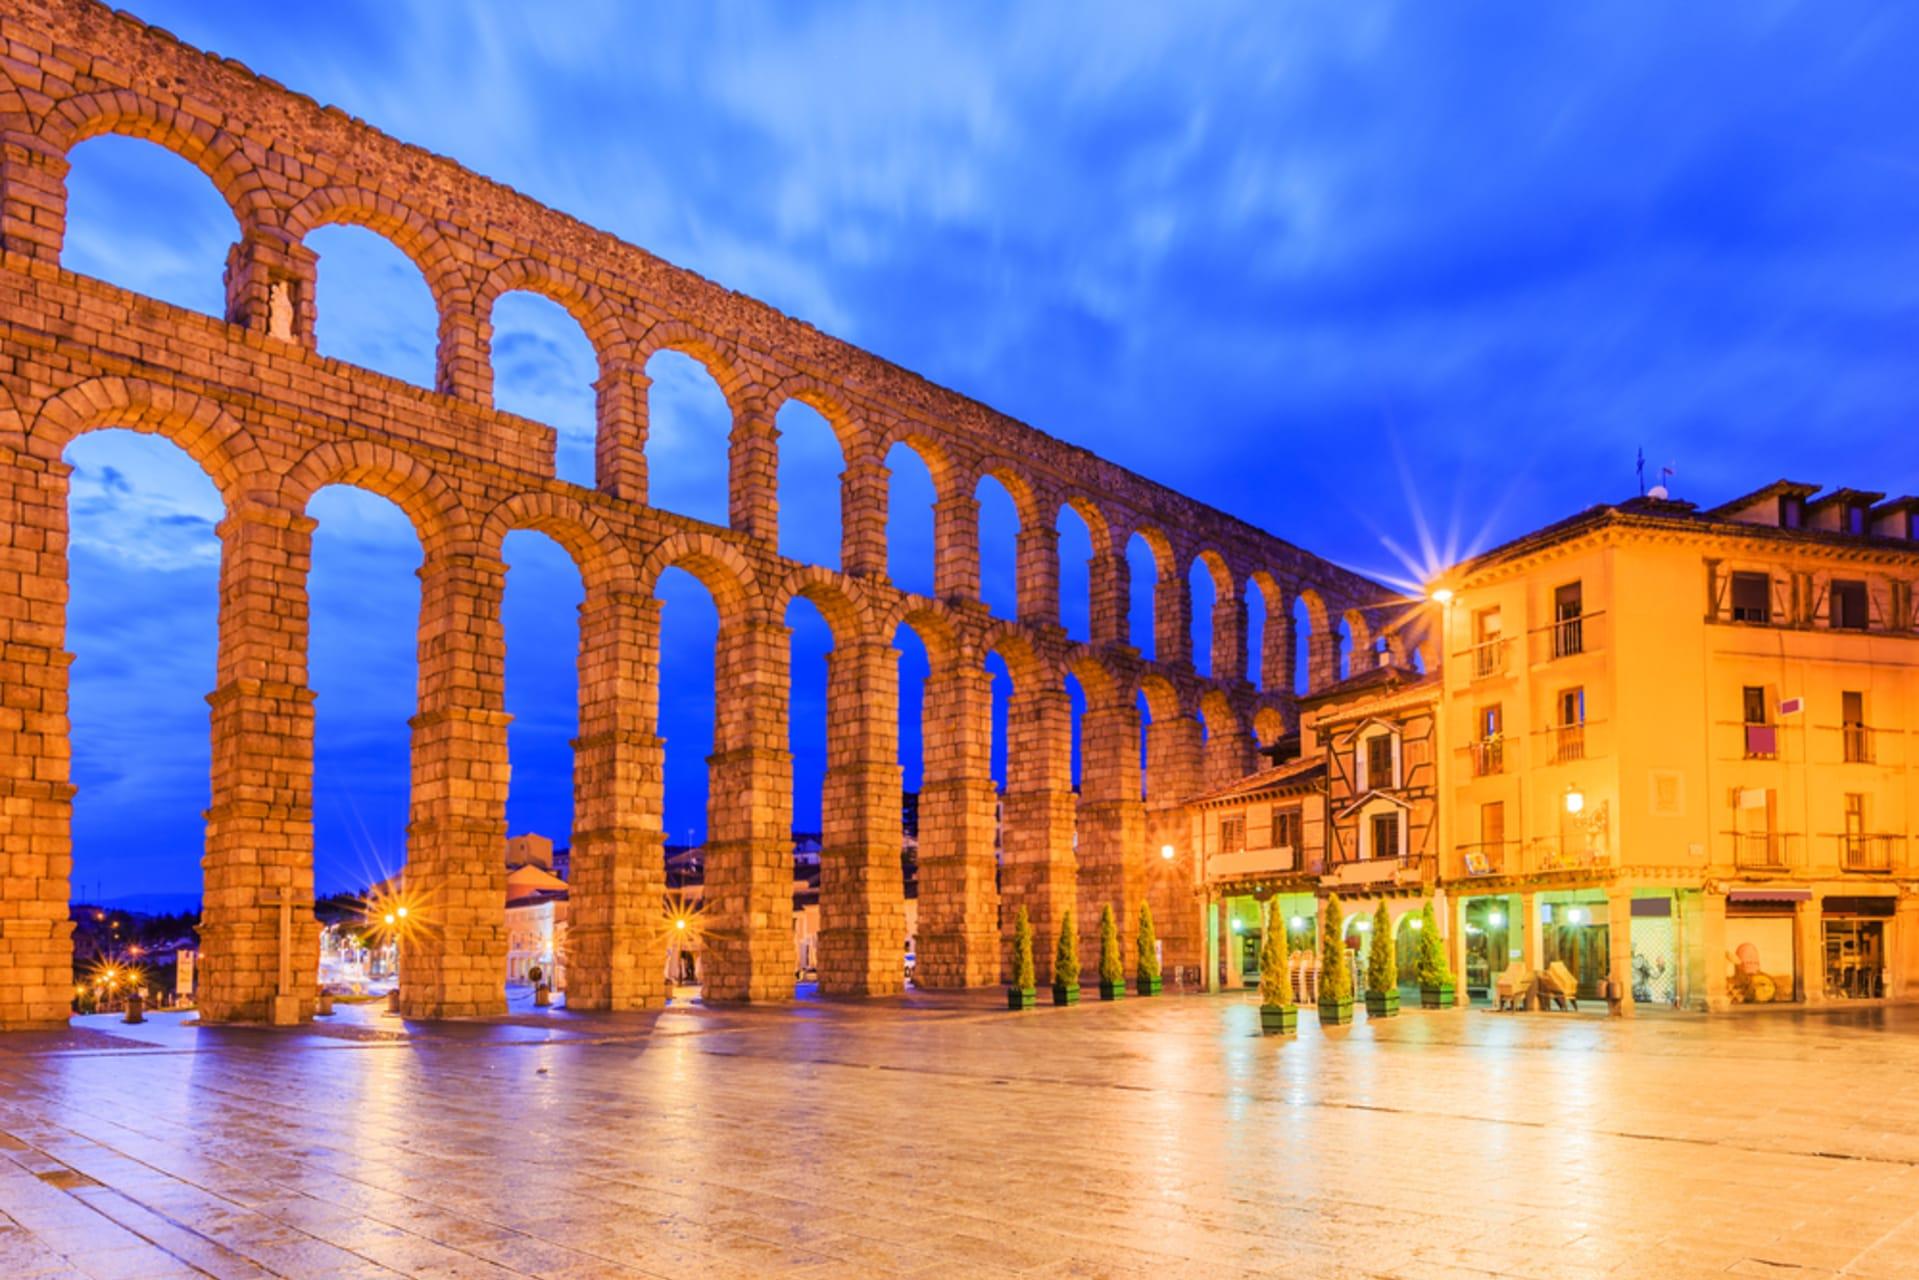 Segovia - Roman-Medieval Segovia by night - the World Heritage town of Castille